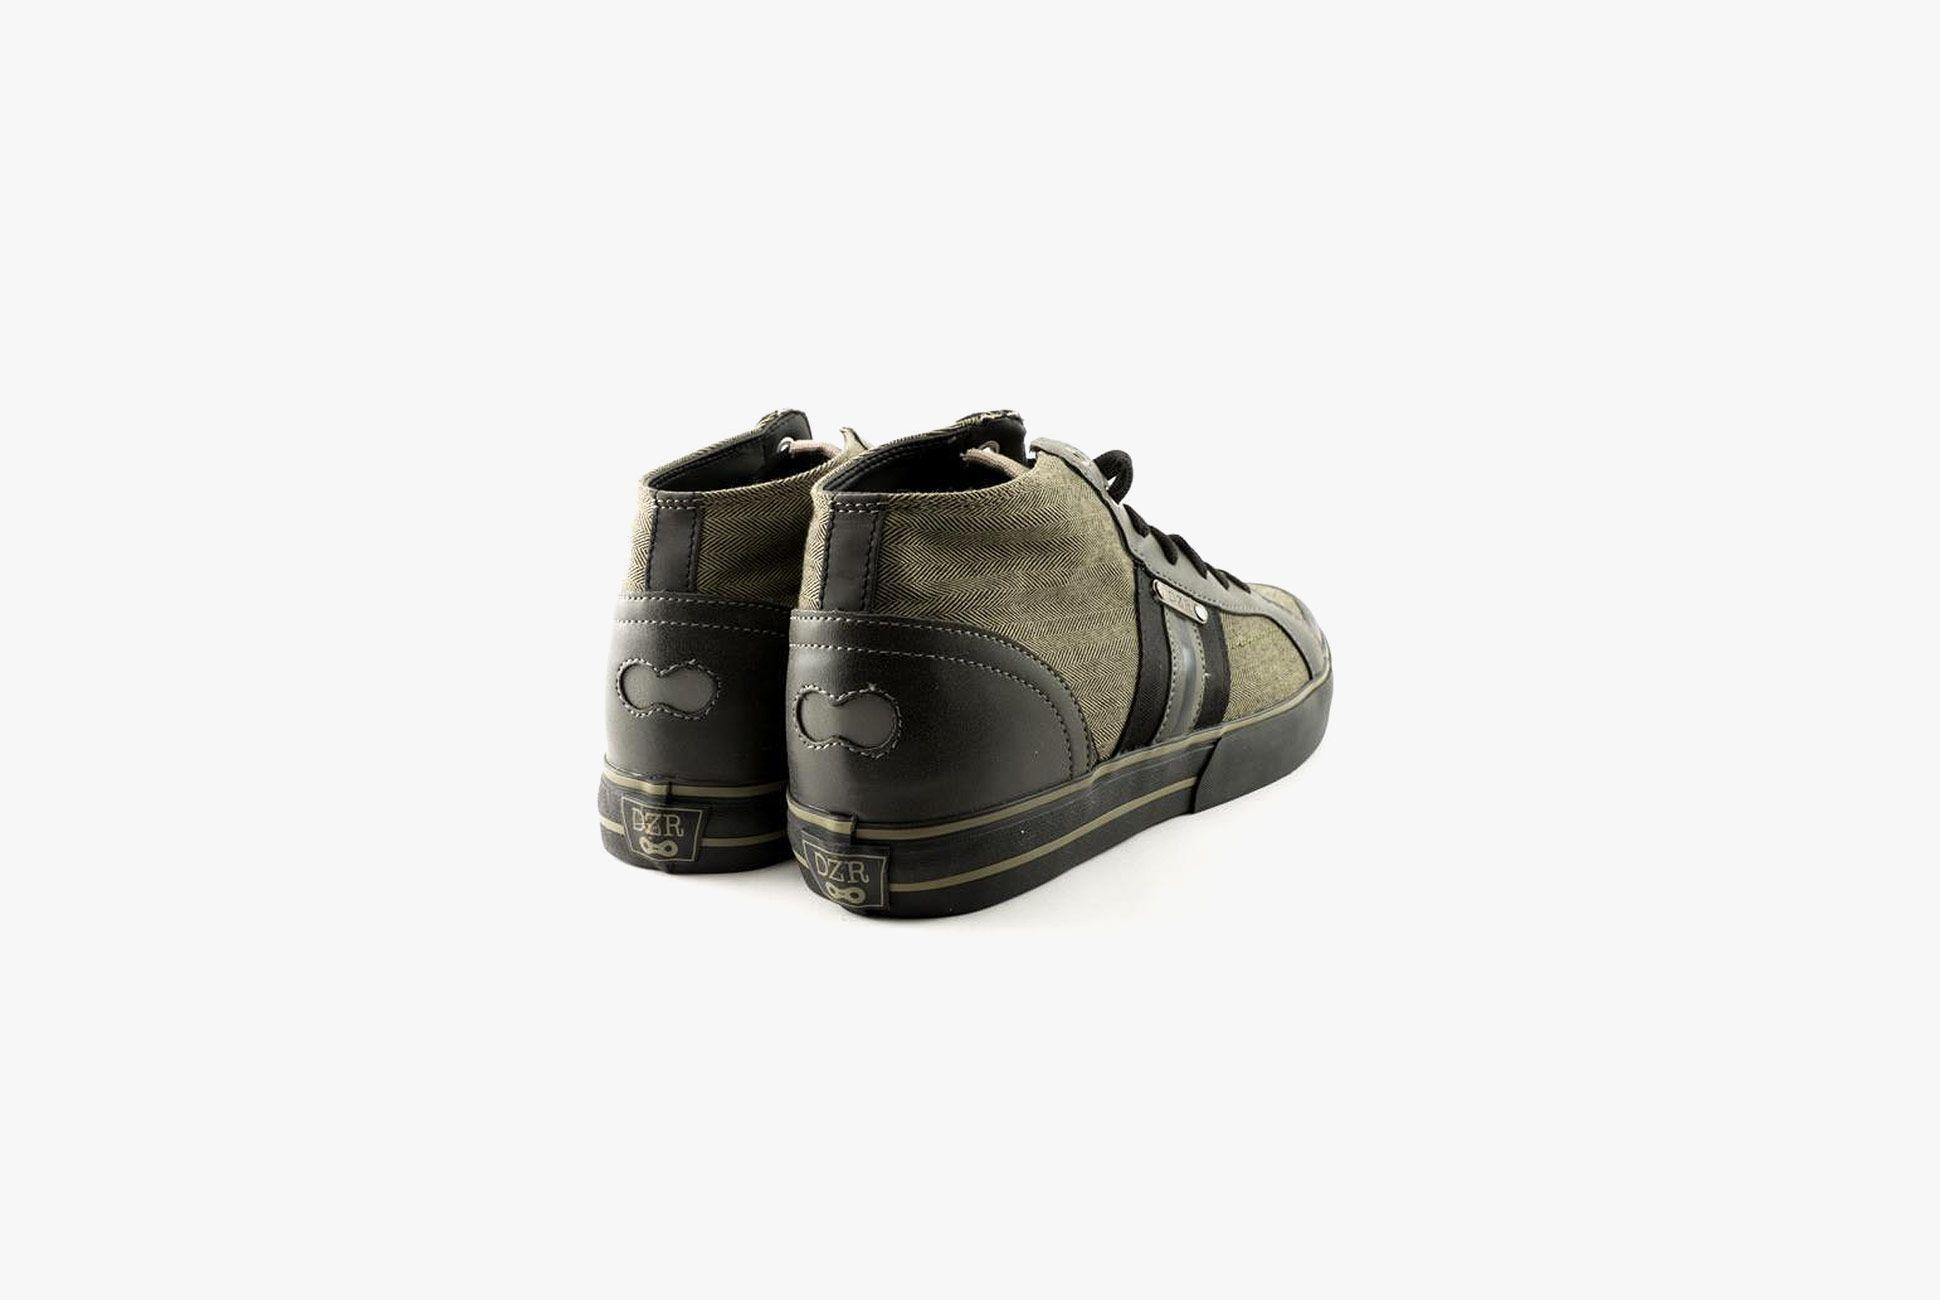 DZR-Shoes-gear-patrol-5